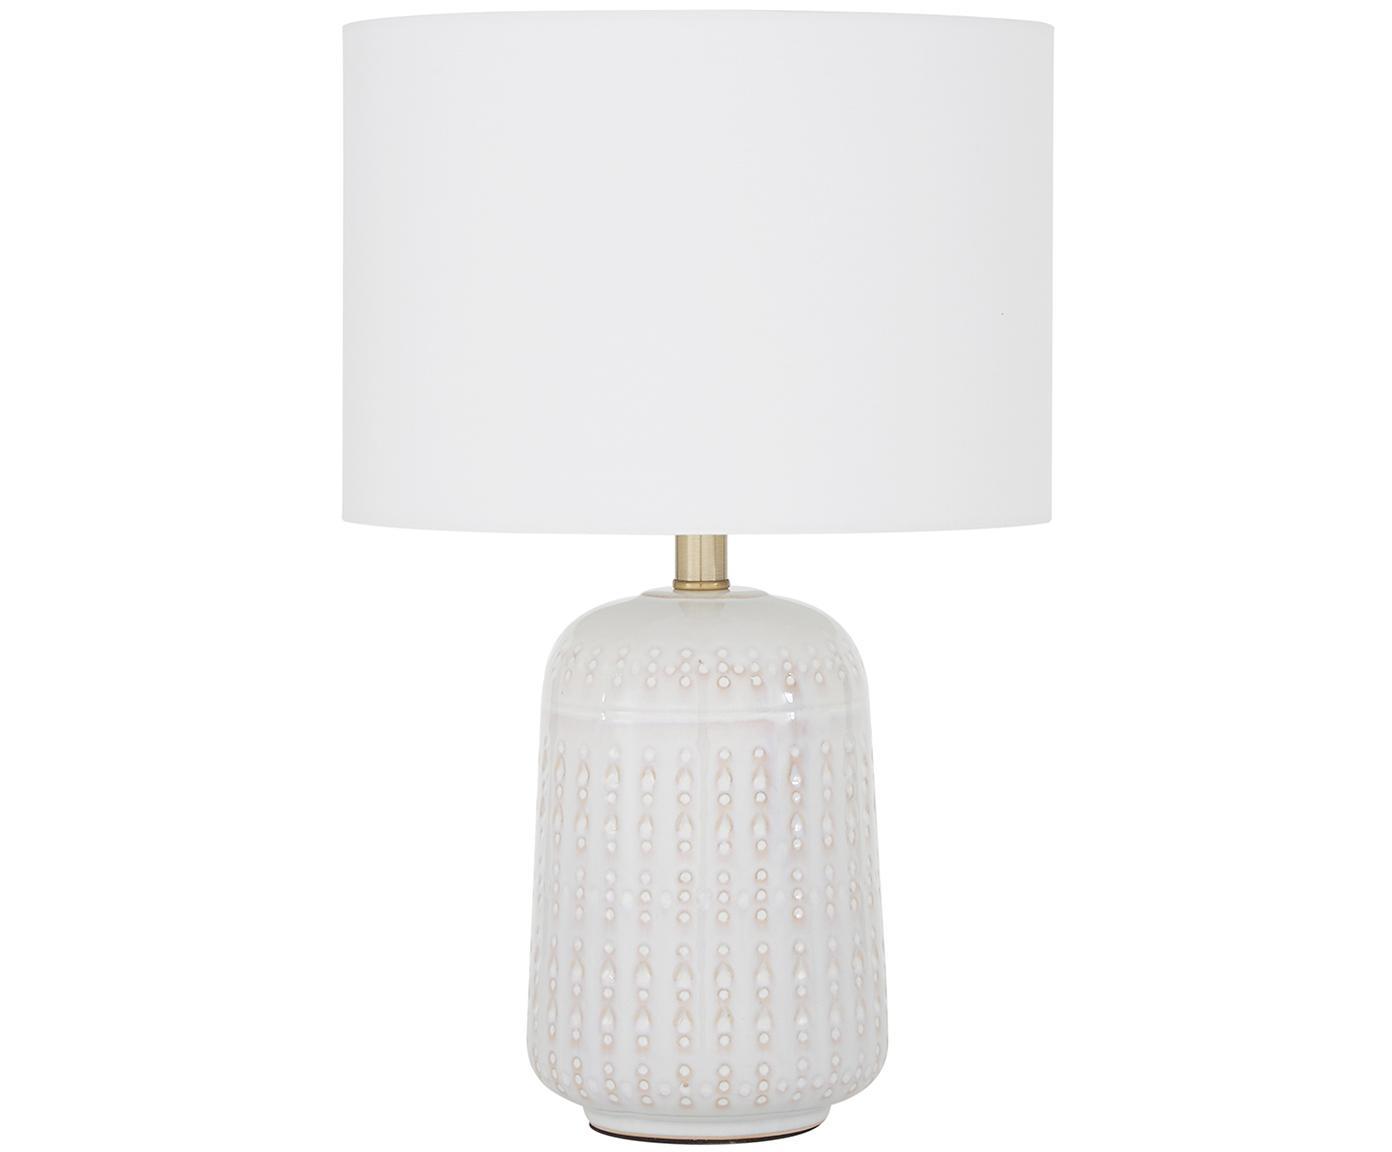 Keramische tafellamp Iva, Lampenkap: textiel, Lampvoet: keramiek, vermessingd met, Lampenkap: witte lampvoet: crèmewit, messing, Ø 33 x H 53 cm